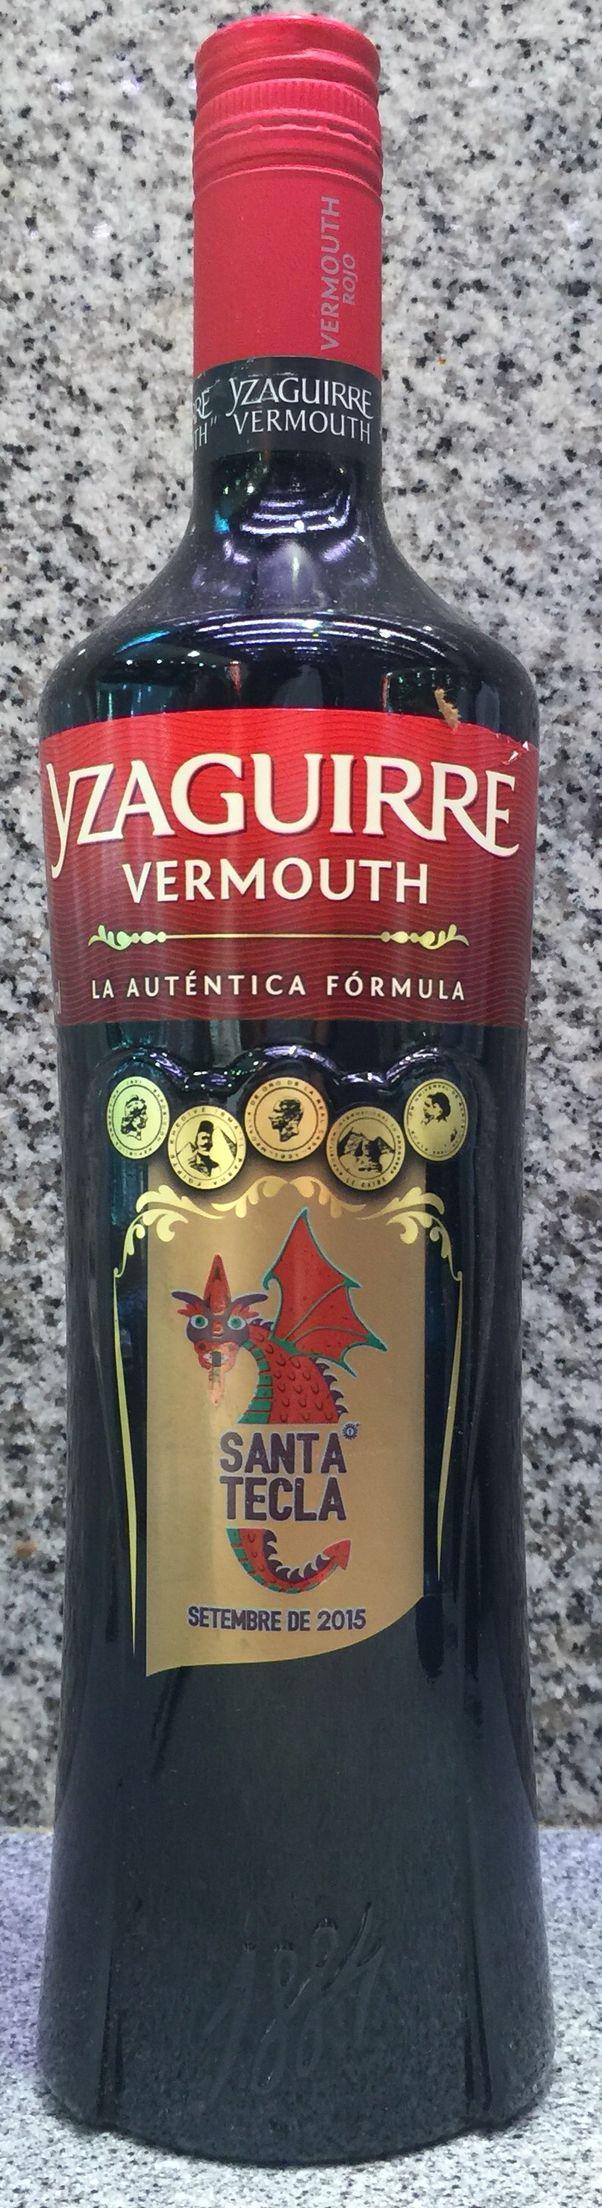 Vermouth a l'effigie de la santa tecla